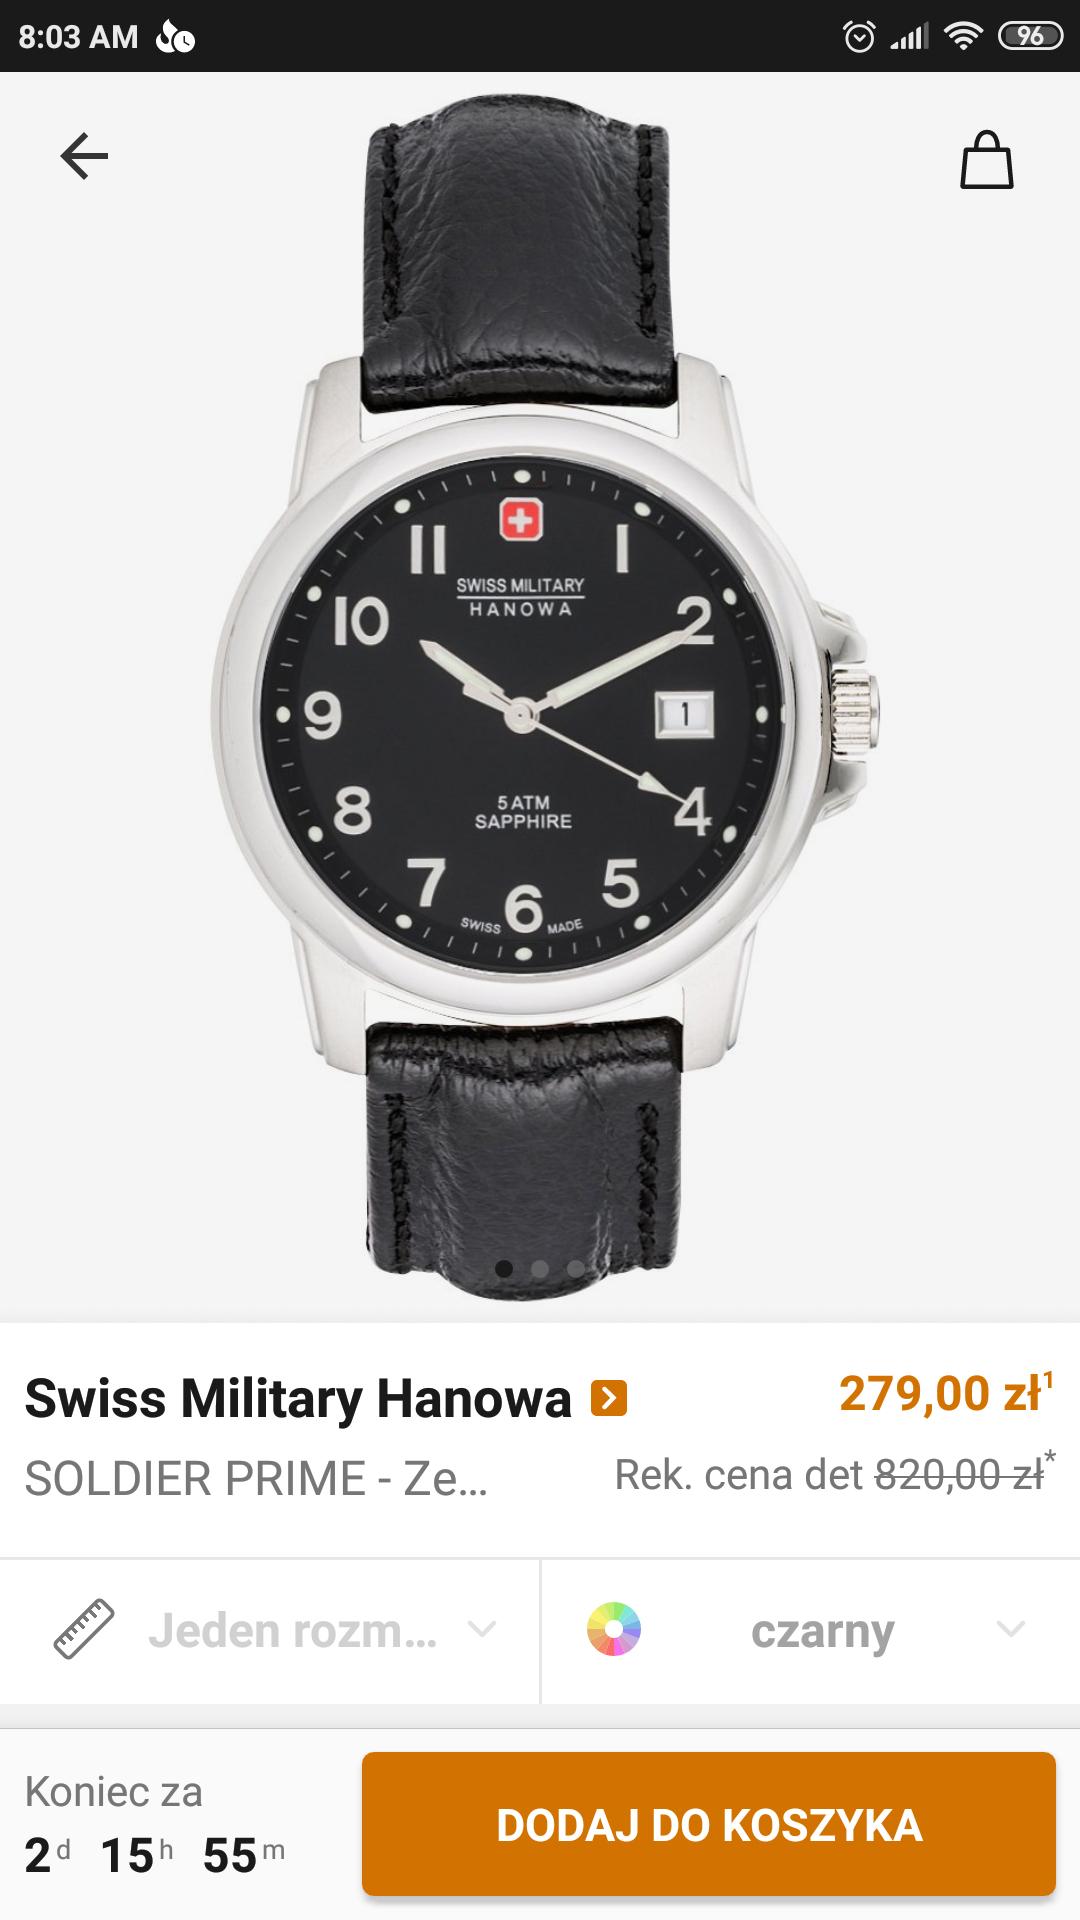 Zegarek Swiss Military Hanova Soldier Prime szafir